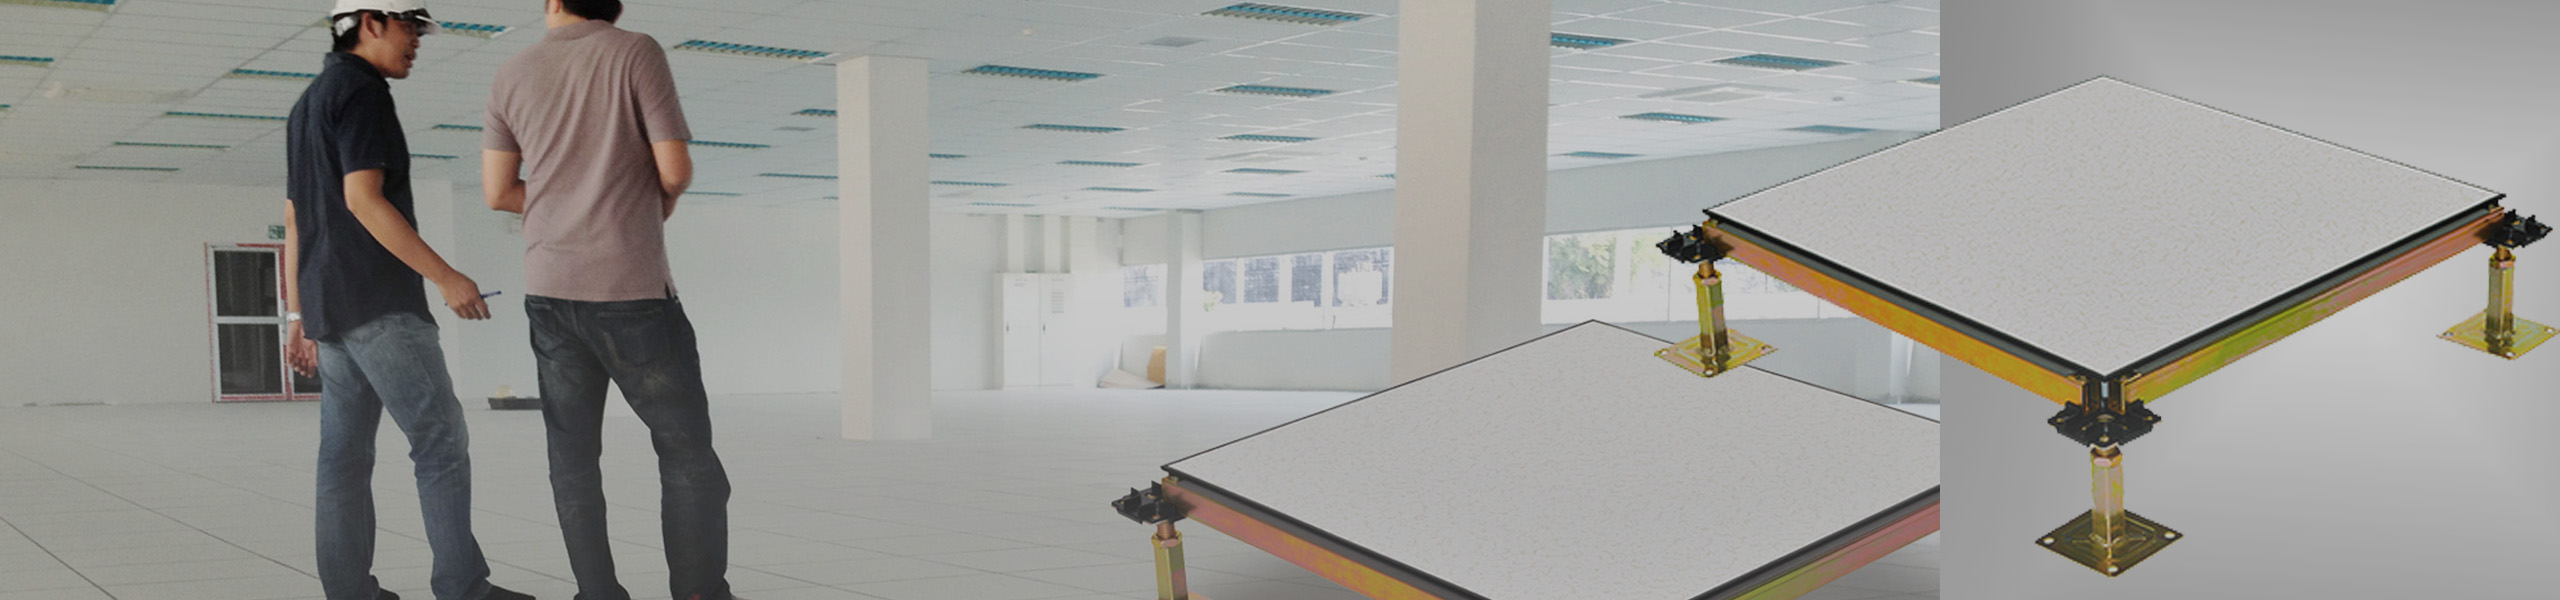 banner_superior_tecniases_floor_tec_piso_tecnico